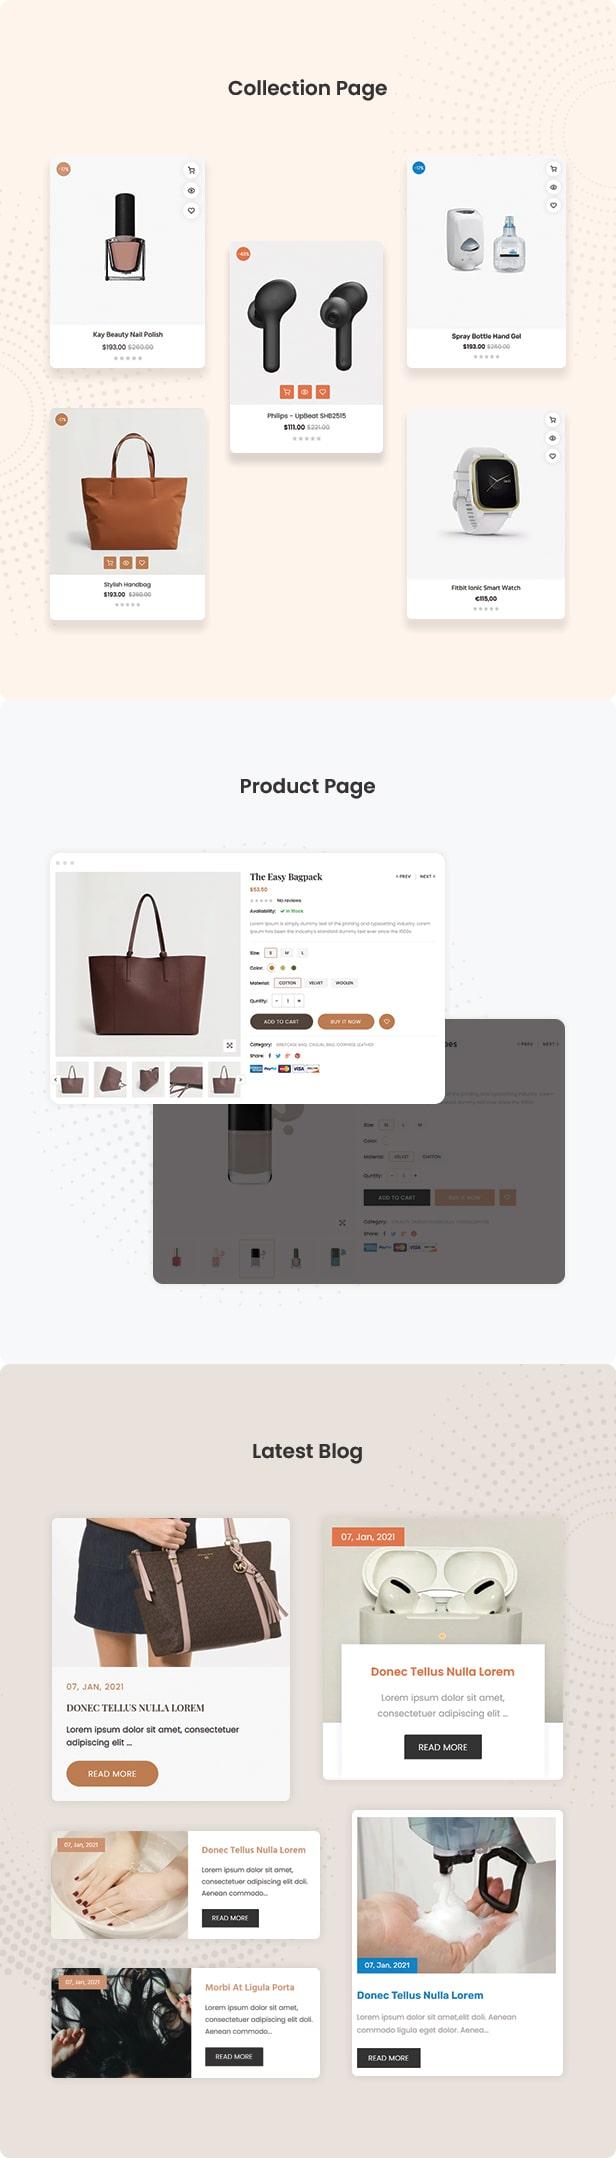 Votto - The Single product Multipurpose Shopify Theme - 4